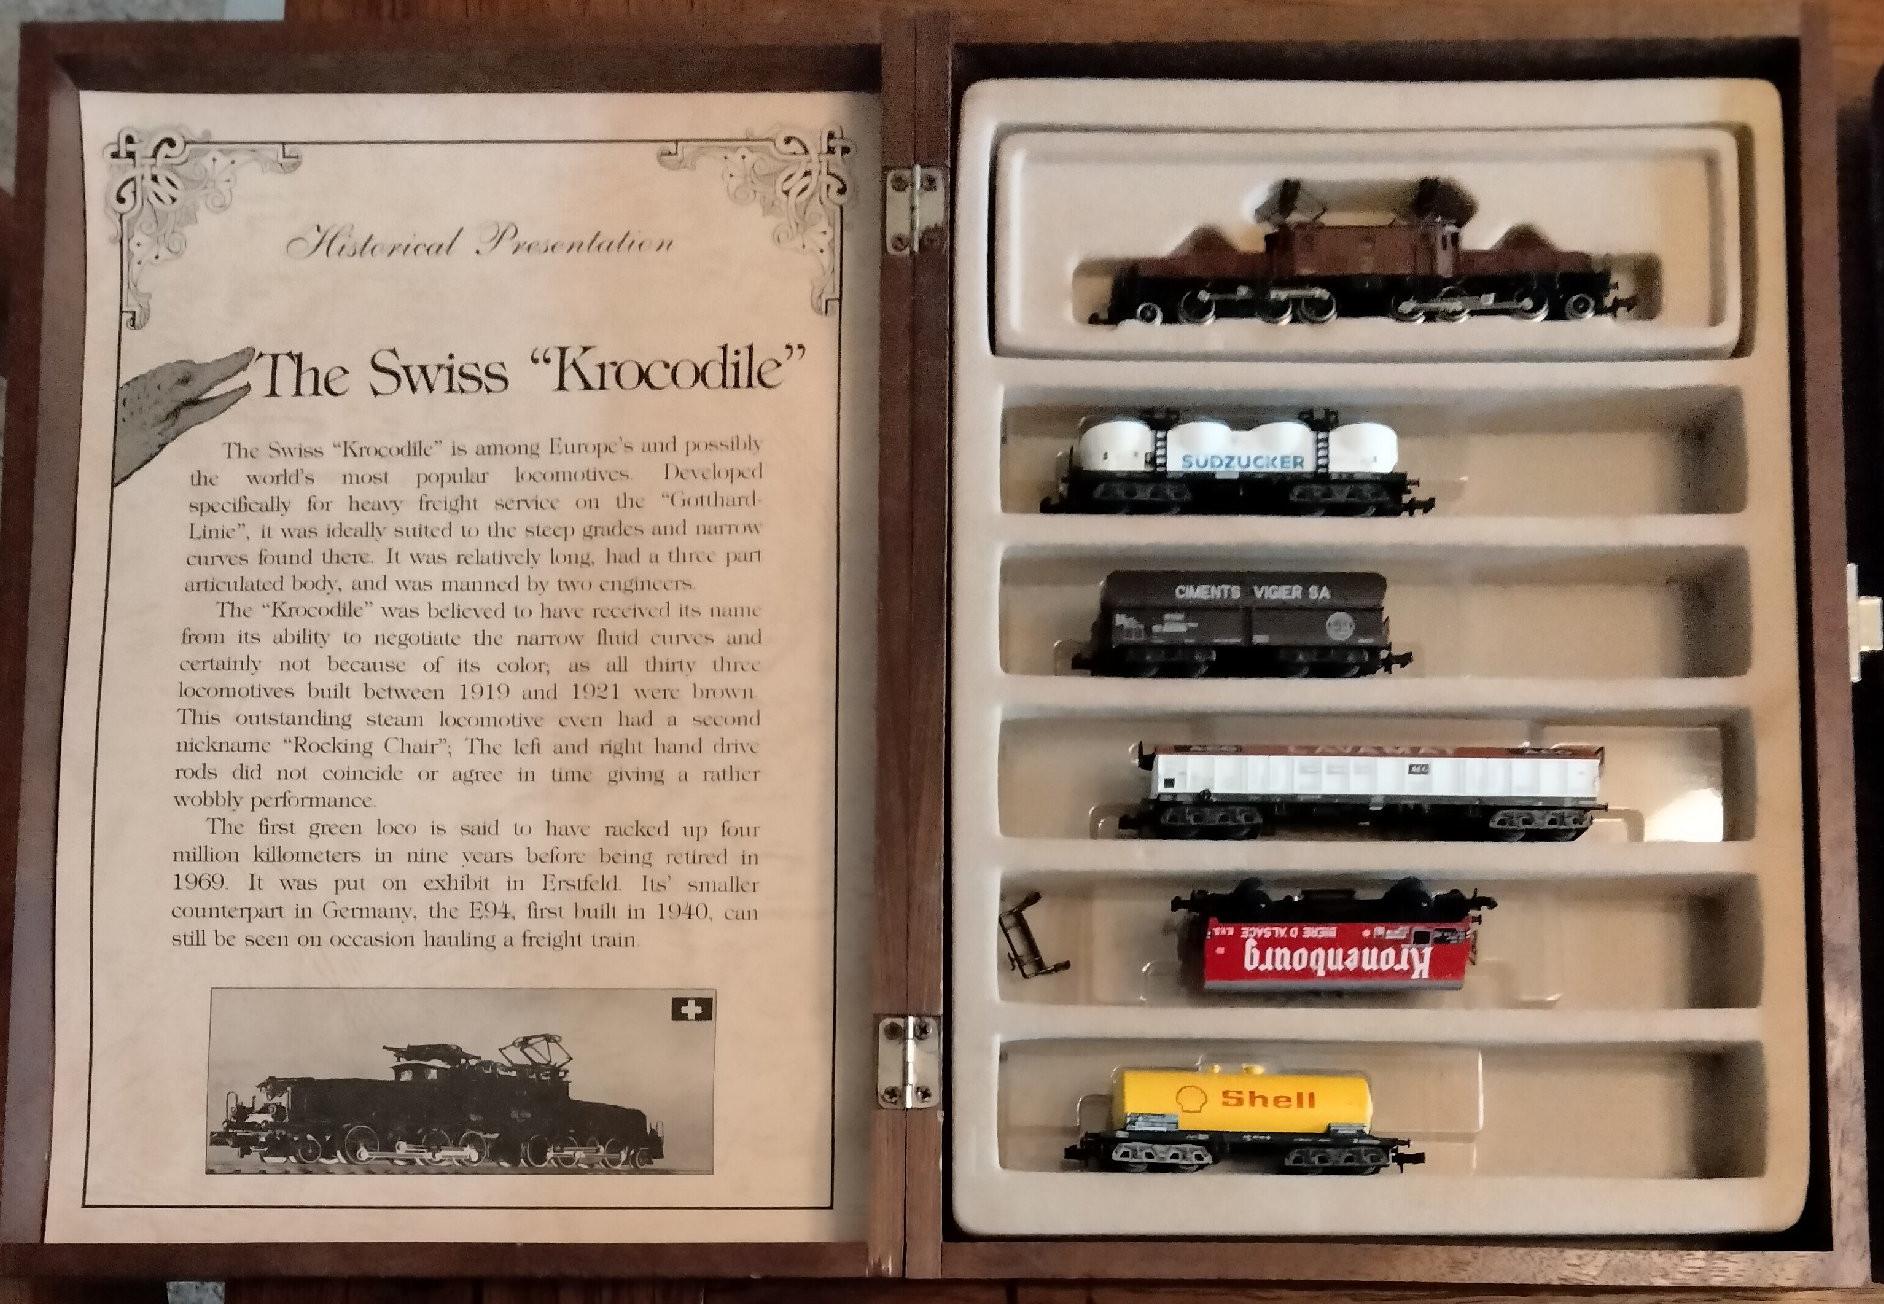 N Scale - Model Power - Krocodile - Freight Train, European, Electric, Epoch II - SBB CFF FFS - Freight Set, 6 Unit